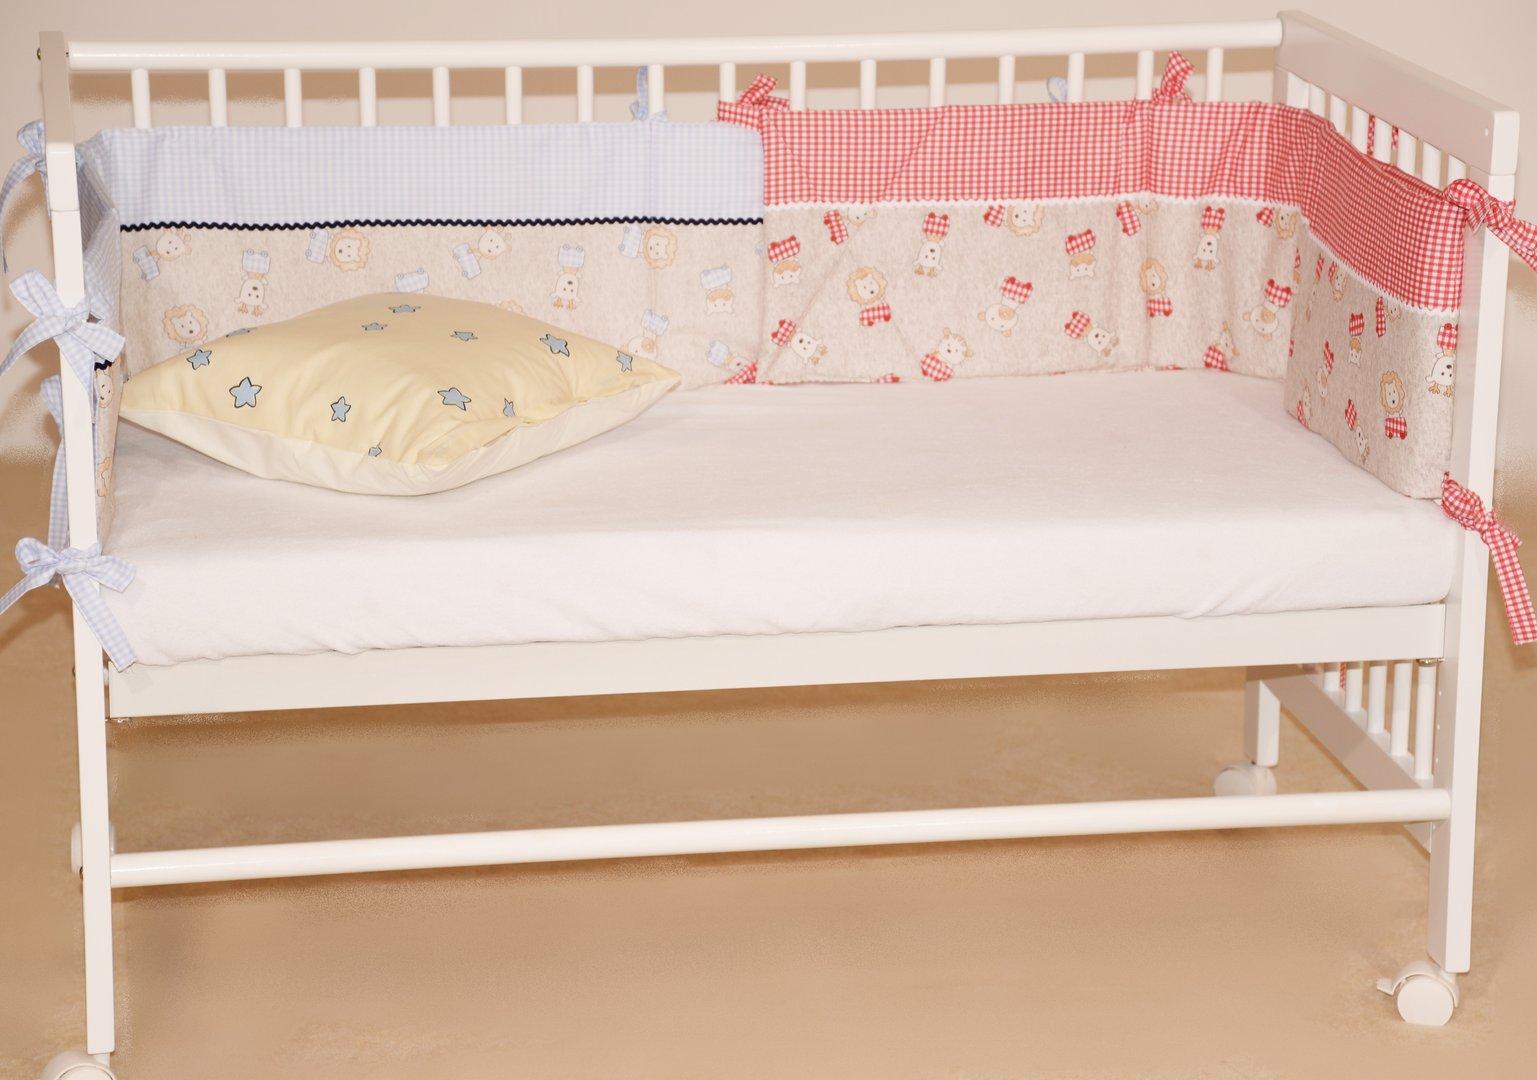 buche 120 x 60 free pinolino gitterbett buche fast neu x. Black Bedroom Furniture Sets. Home Design Ideas